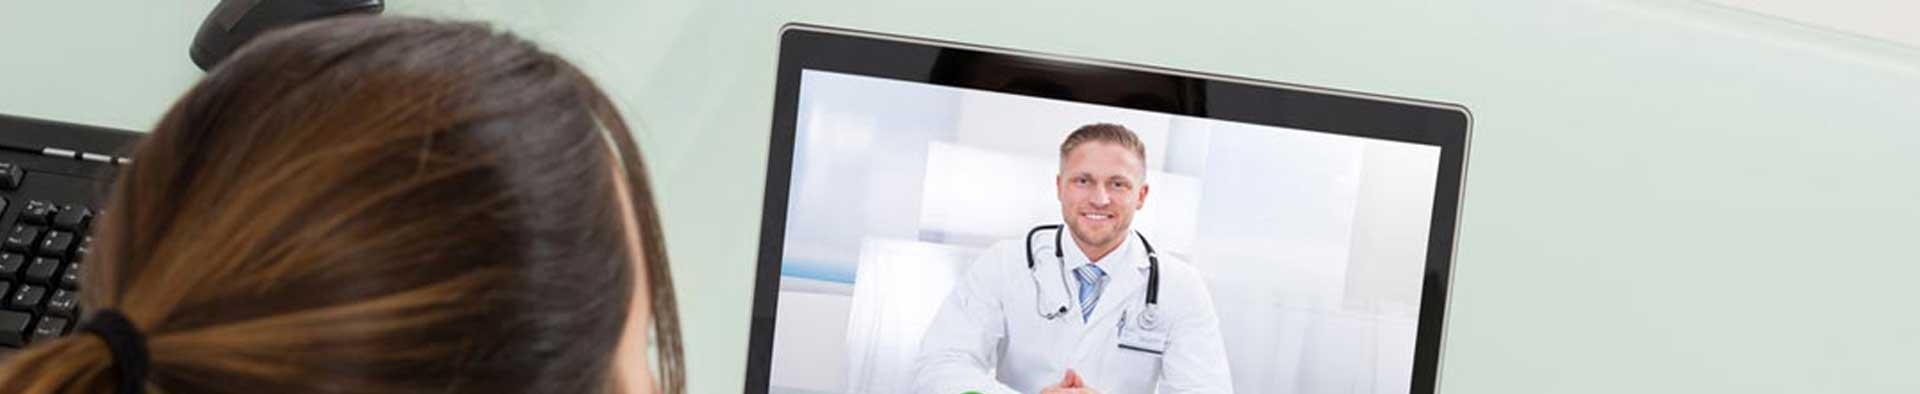 Sistema de cita previa online con Videollamada integrada